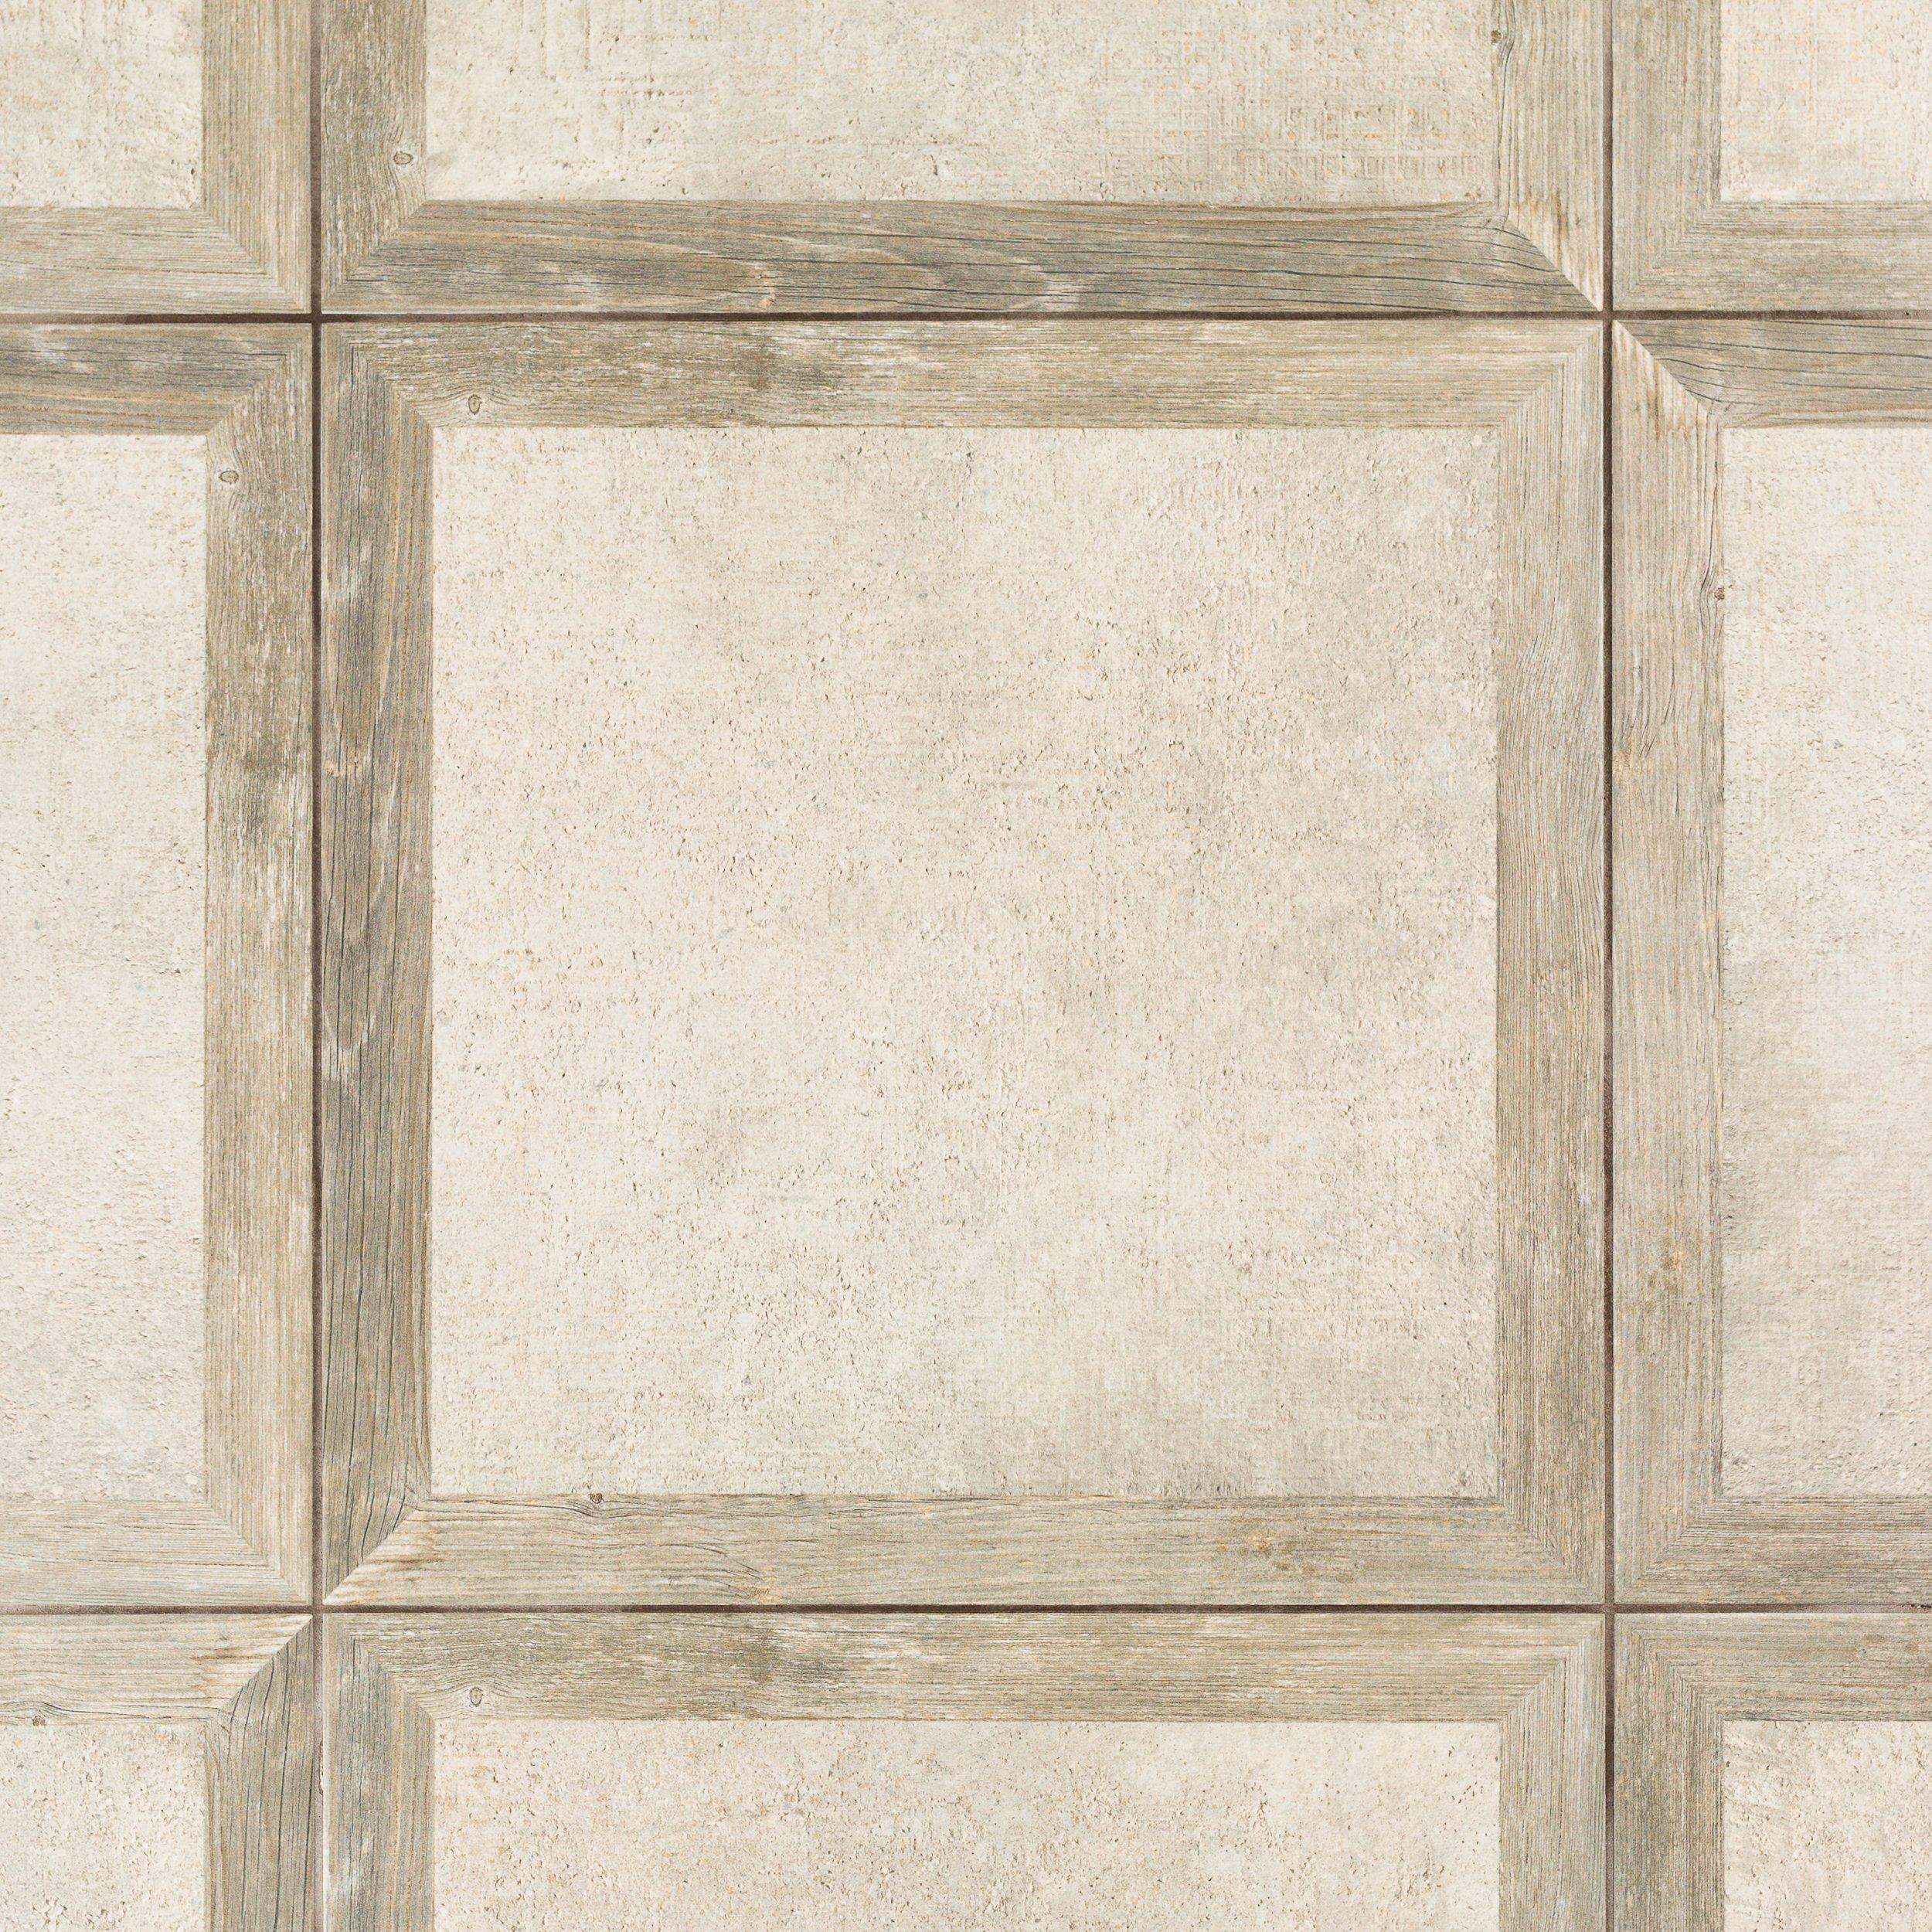 Regina gray porcelain tile 24 x 24 100211036 floor and decor dailygadgetfo Gallery